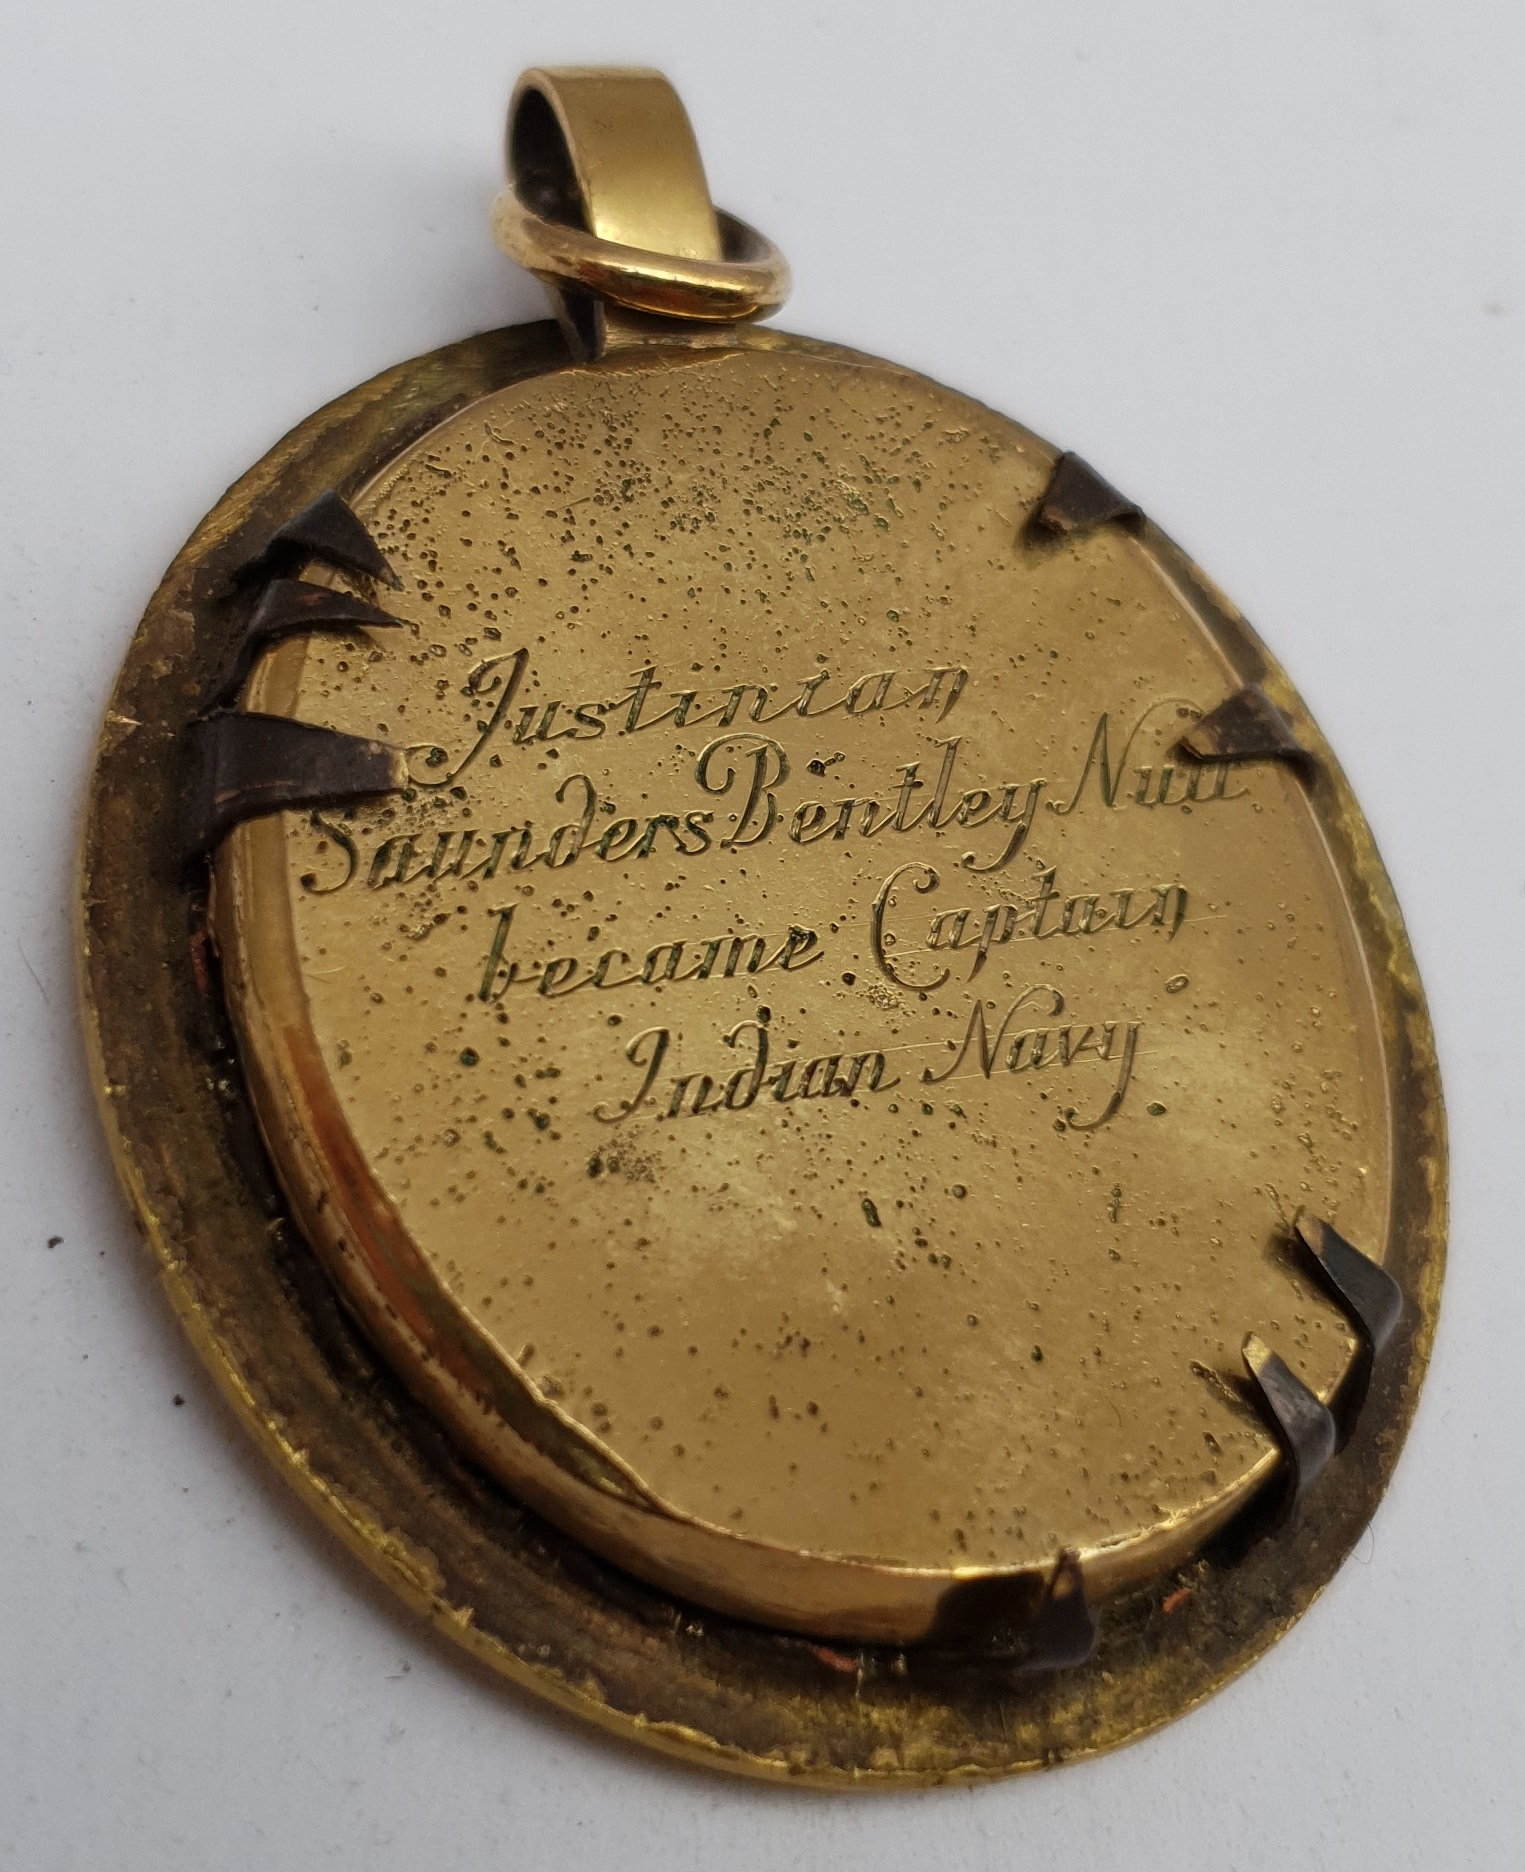 Penelope Carwardine (British 1729-1804): 'Justinian Saunders Bentley Nutt' - Image 7 of 7